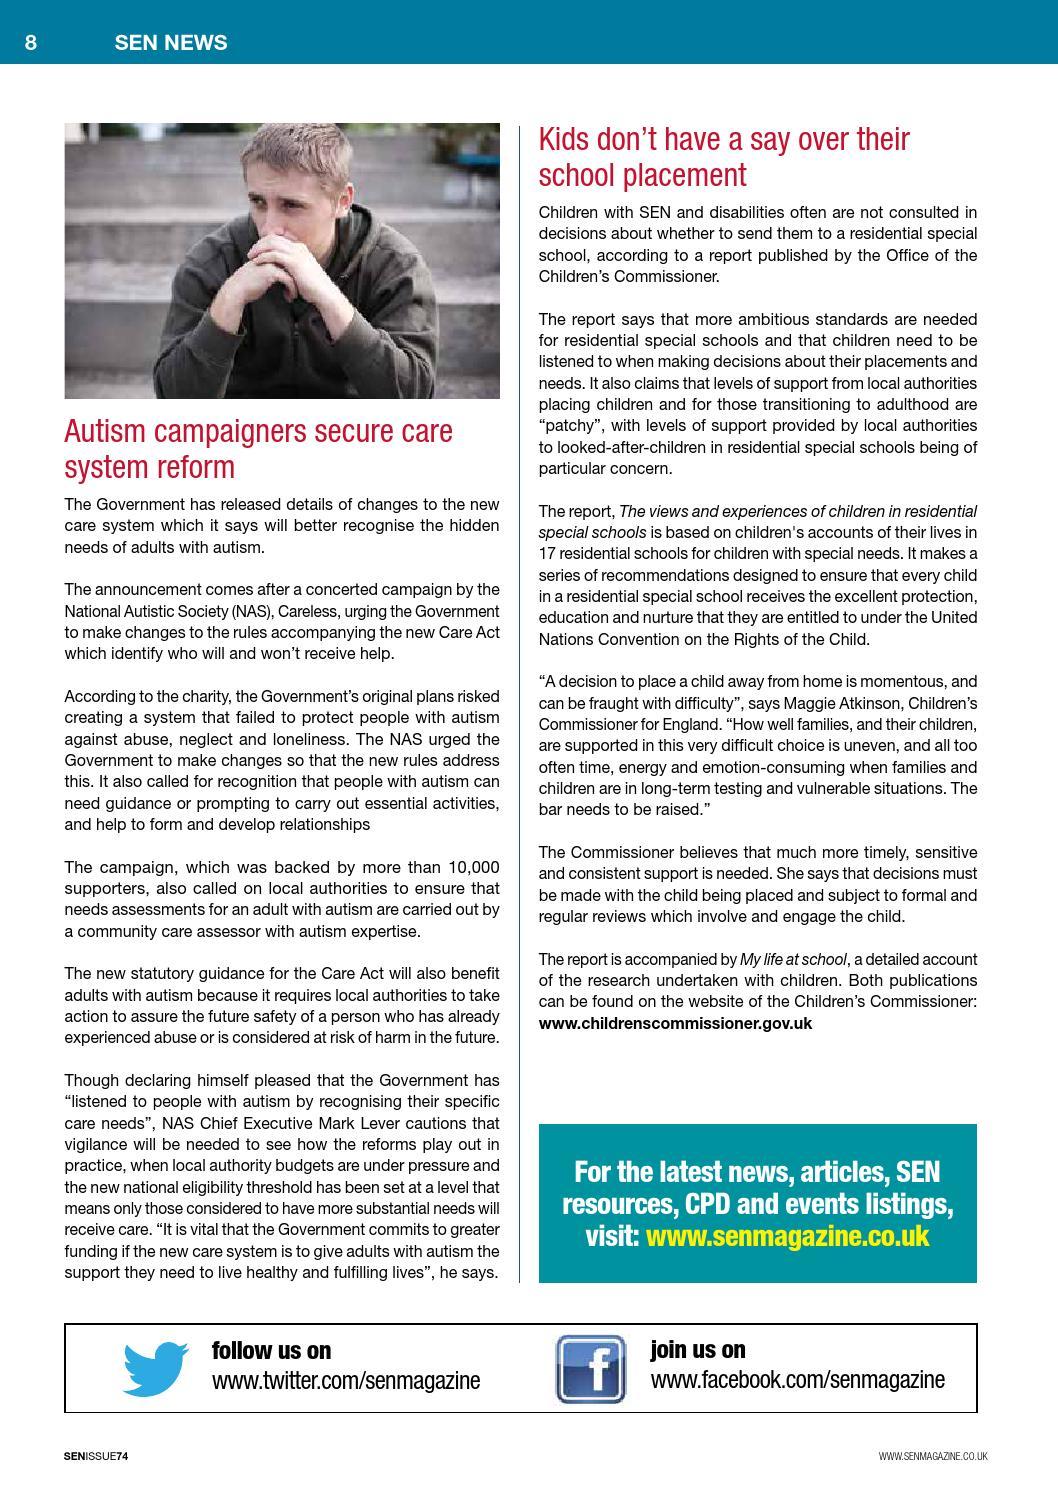 SEN Magazine - SEN74 - Jan/Feb 2015 by SEN Magazine - issuu